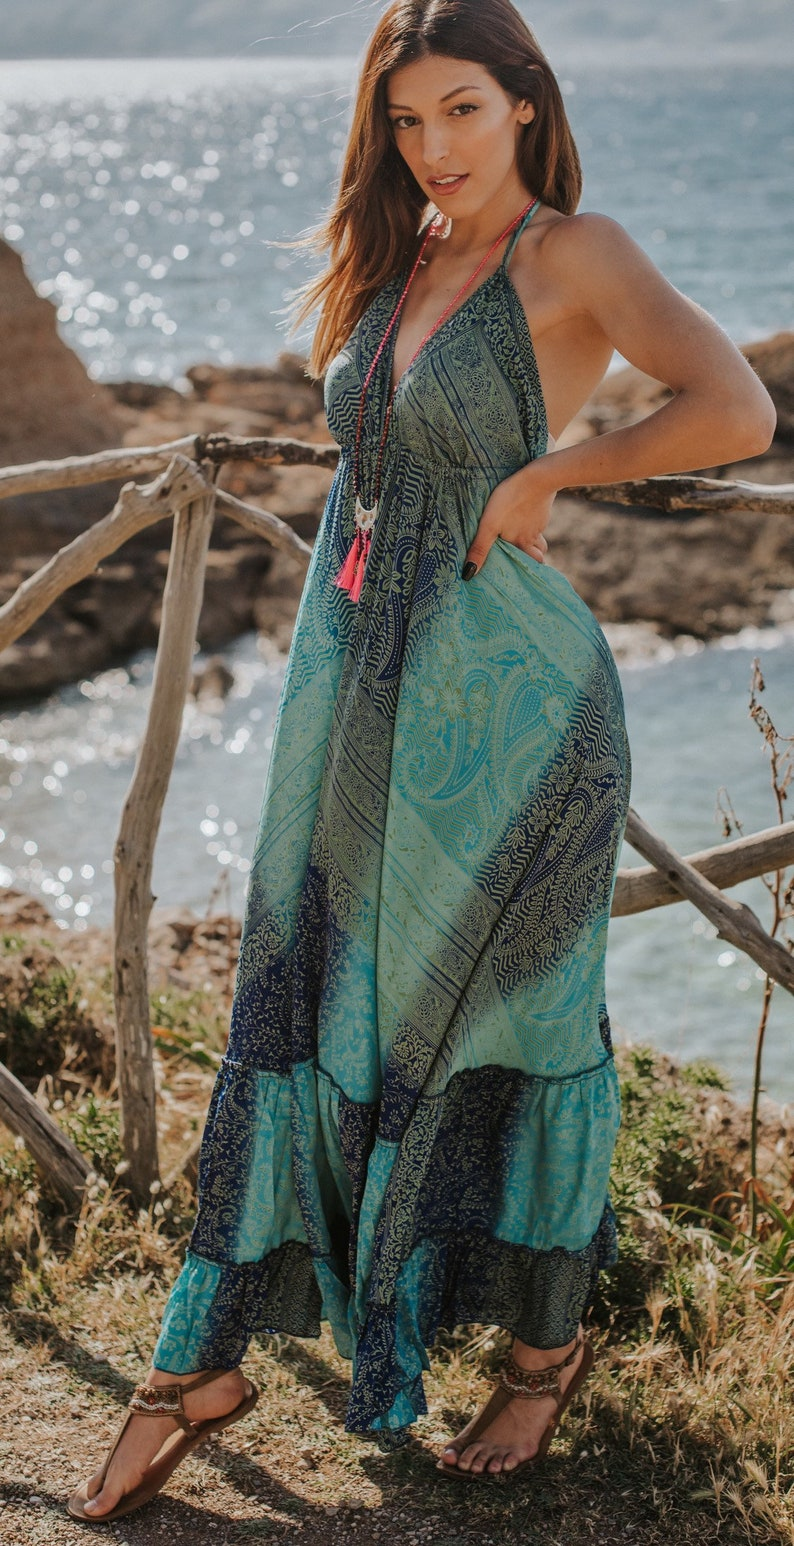 Turquoise Blue Boho Maxi Summer Dress Sexy Long Summer Dress image 0